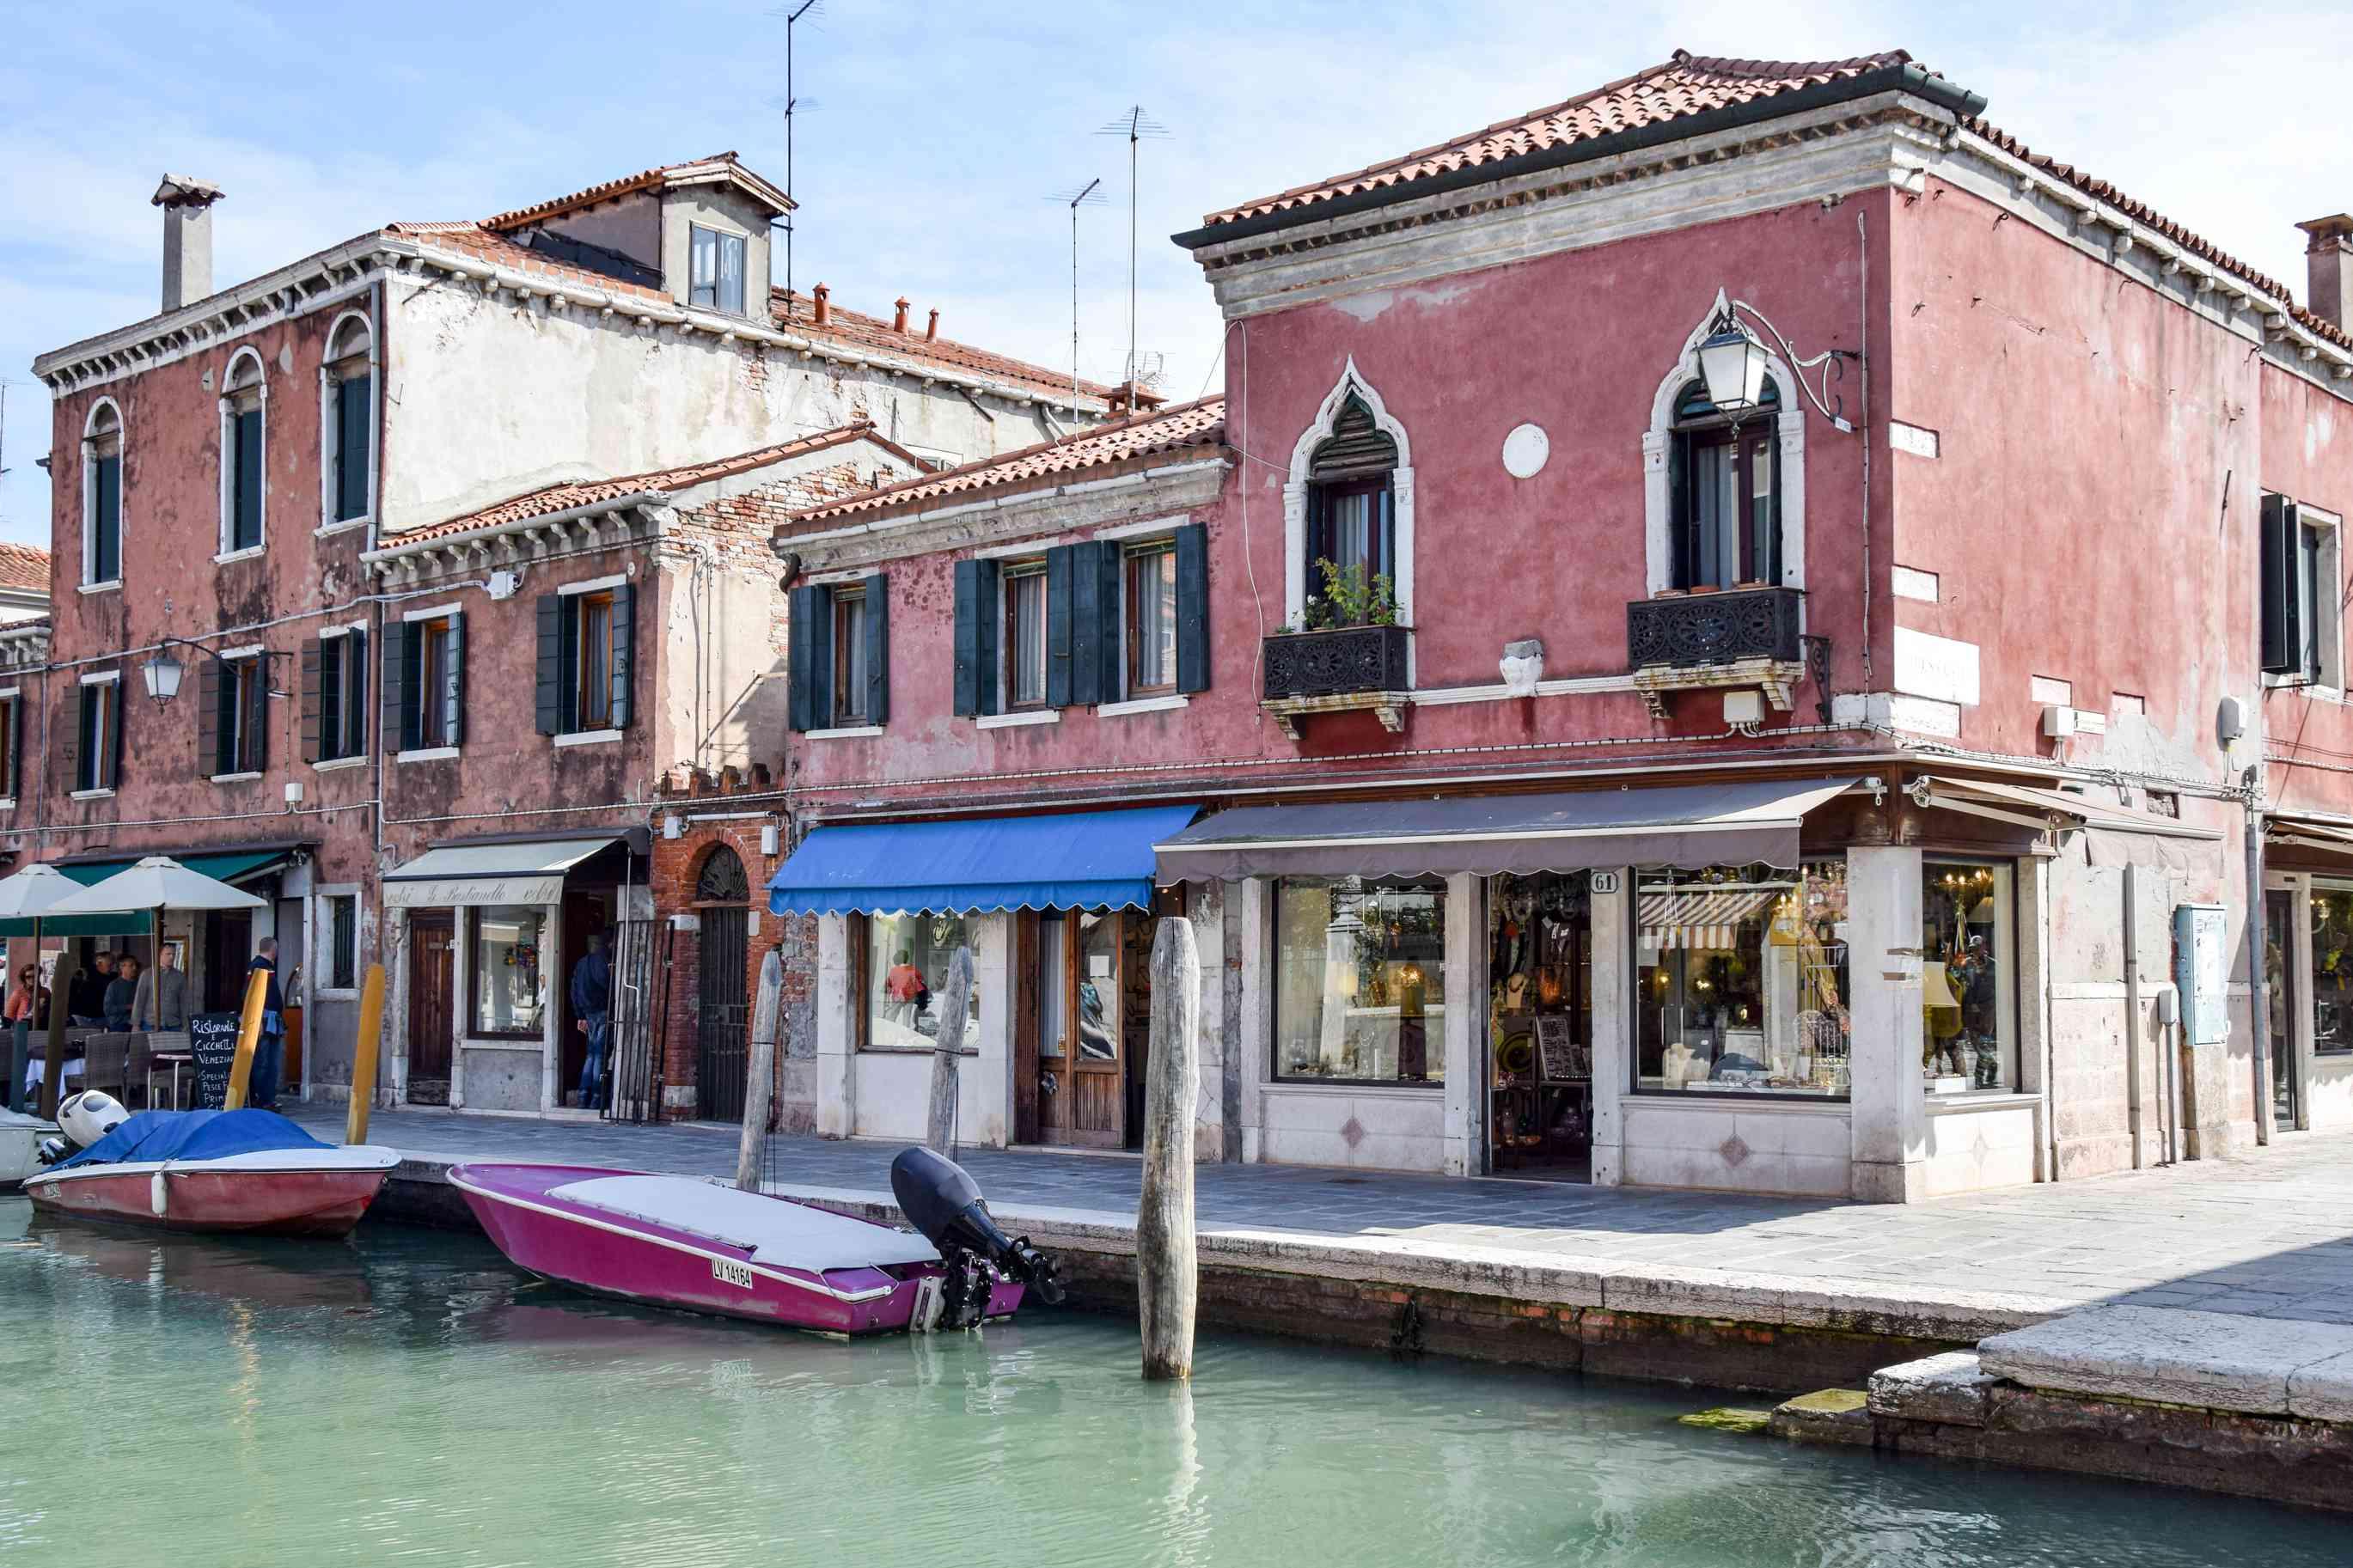 Shops in Murano